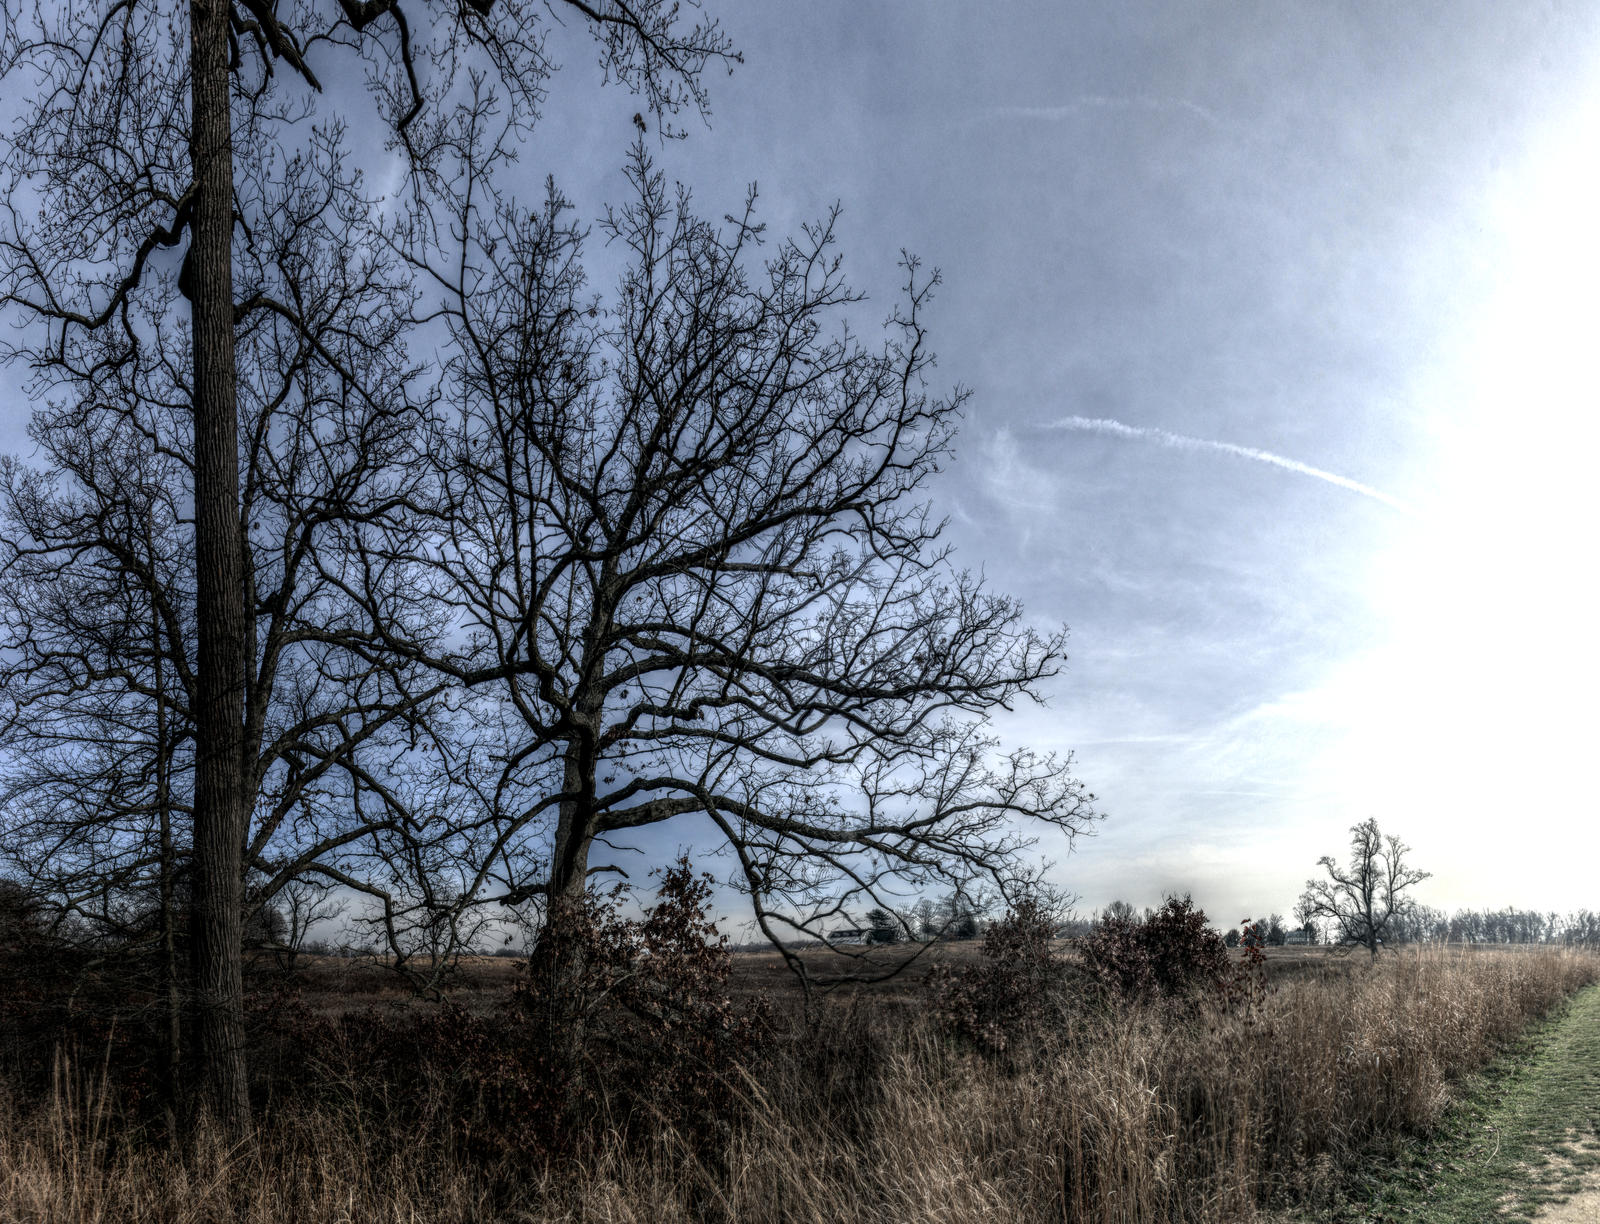 Panorama 3511 hdr pregamma 1 mantiuk06 contrast ma by bruhinb